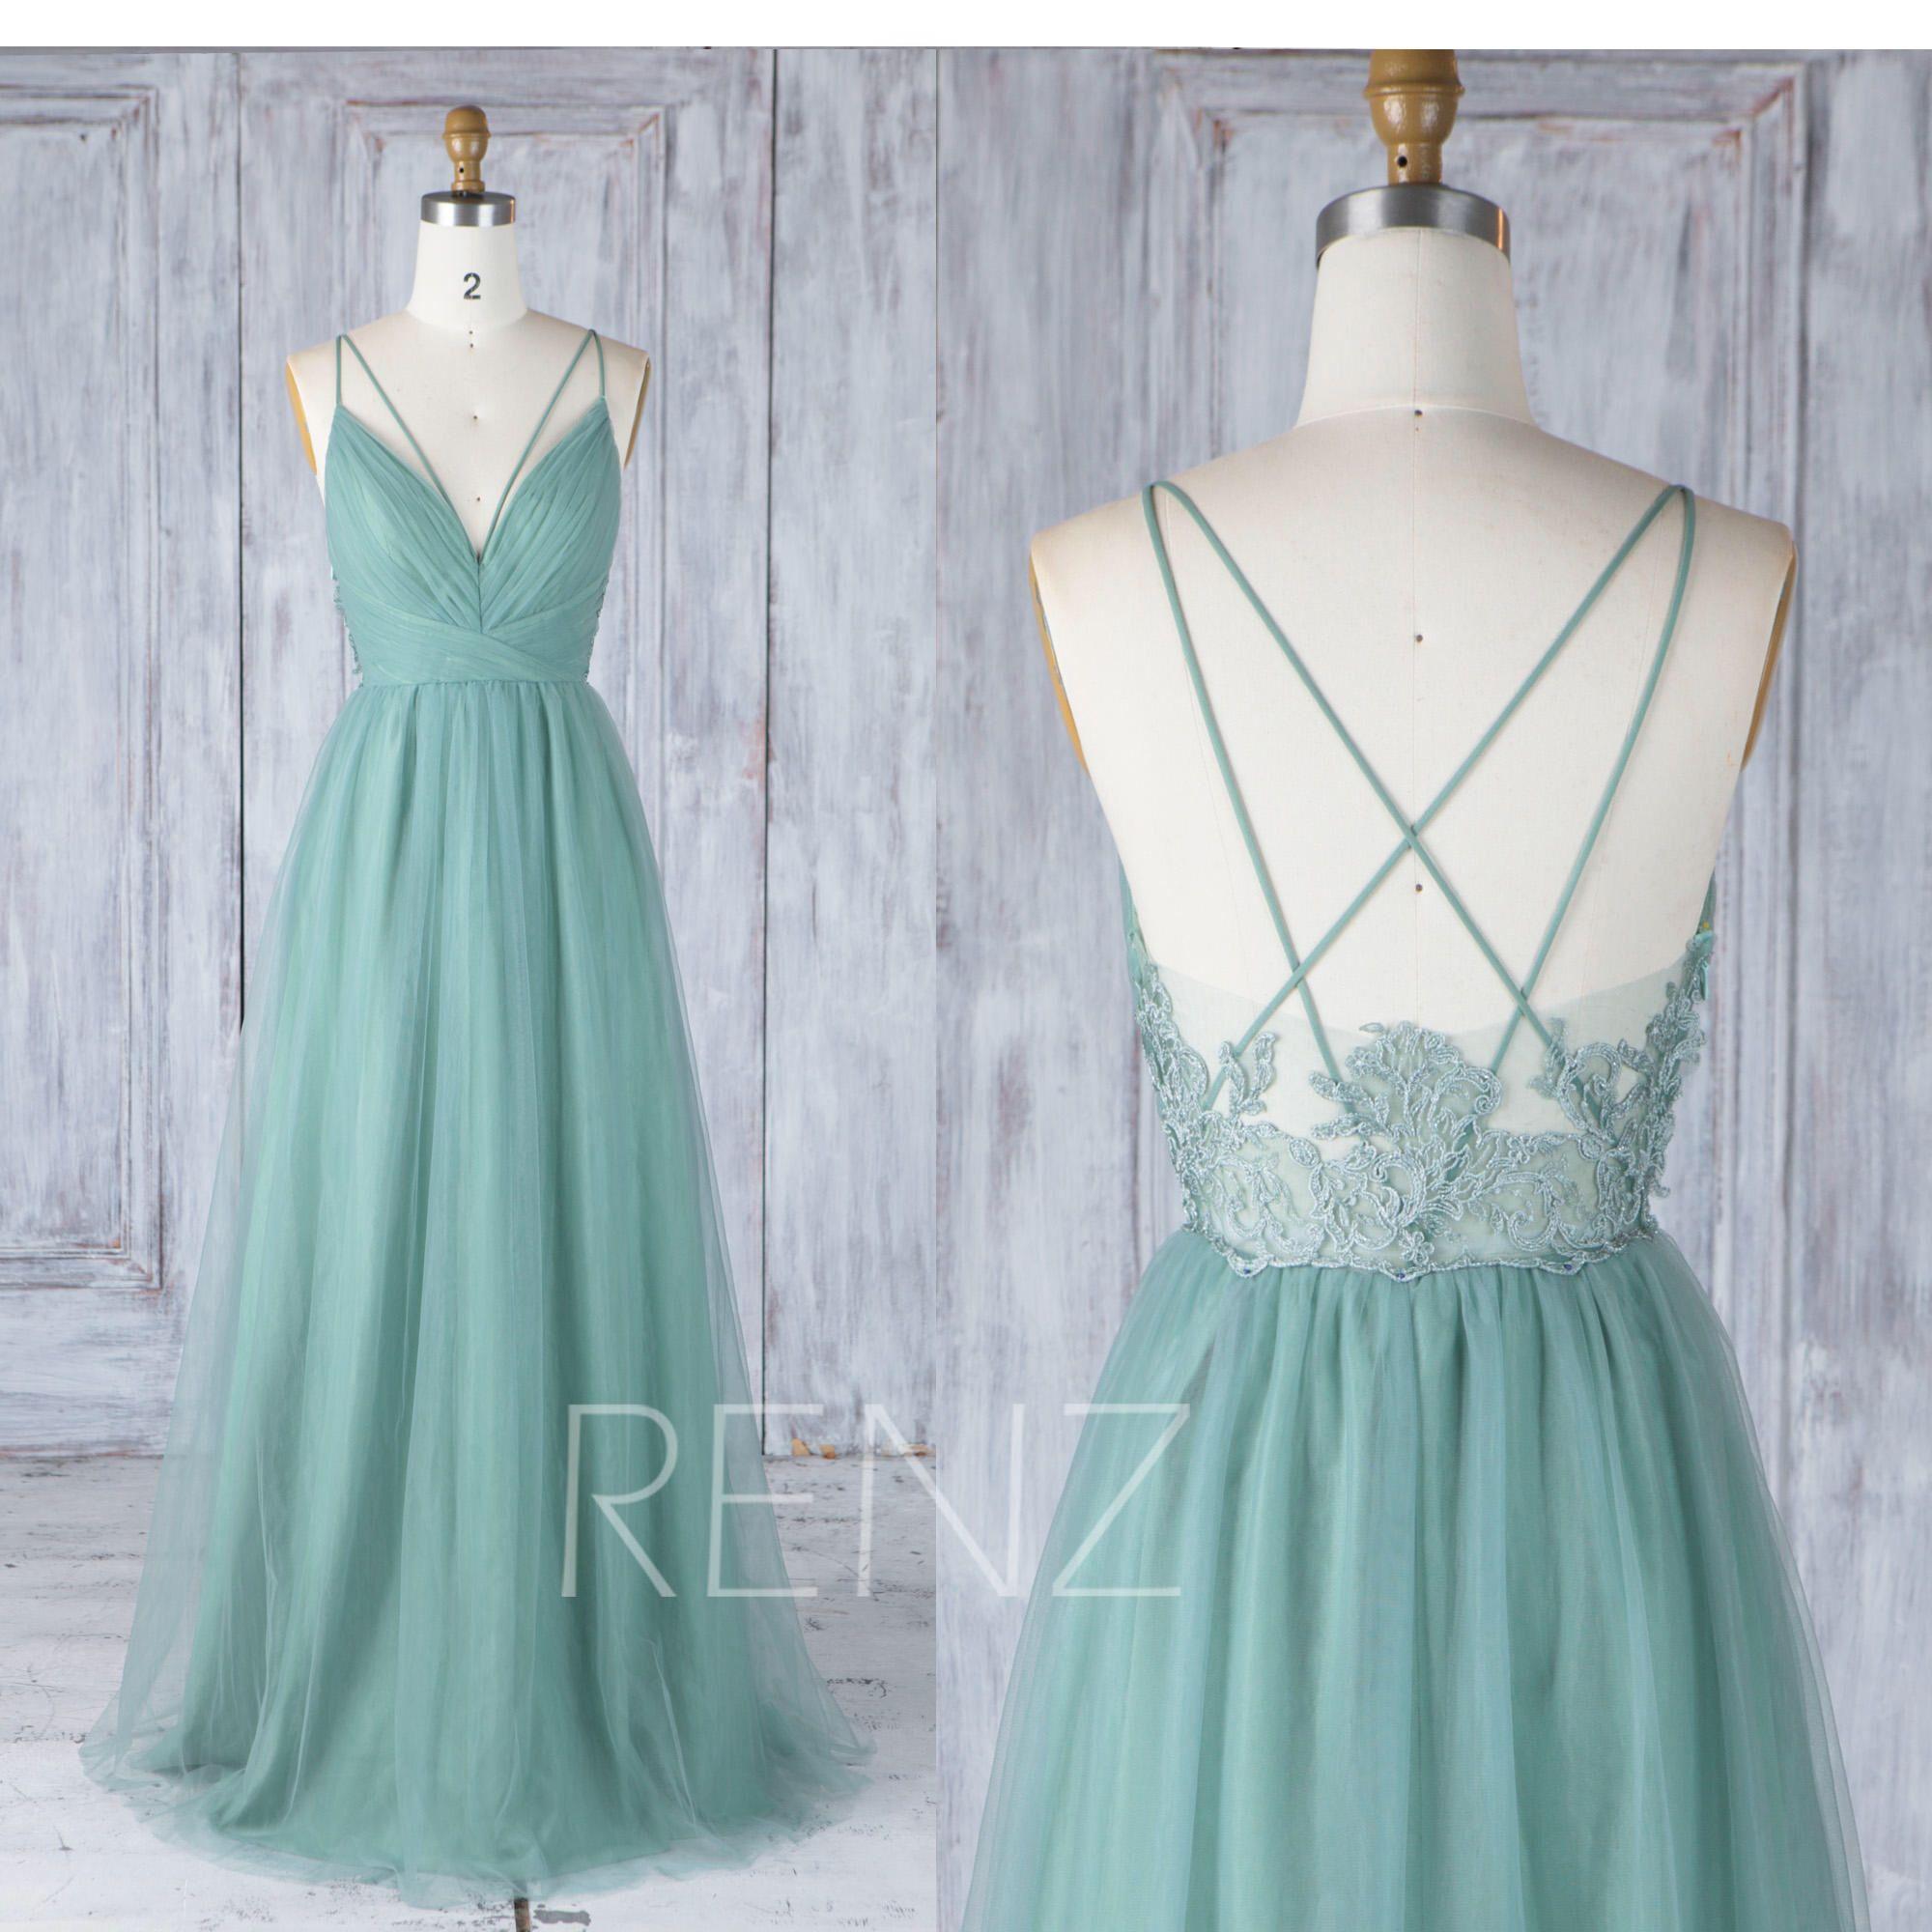 Bridesmaid Dress Dusty Green Tulle Wedding Dress,Criss Cross Straps ...